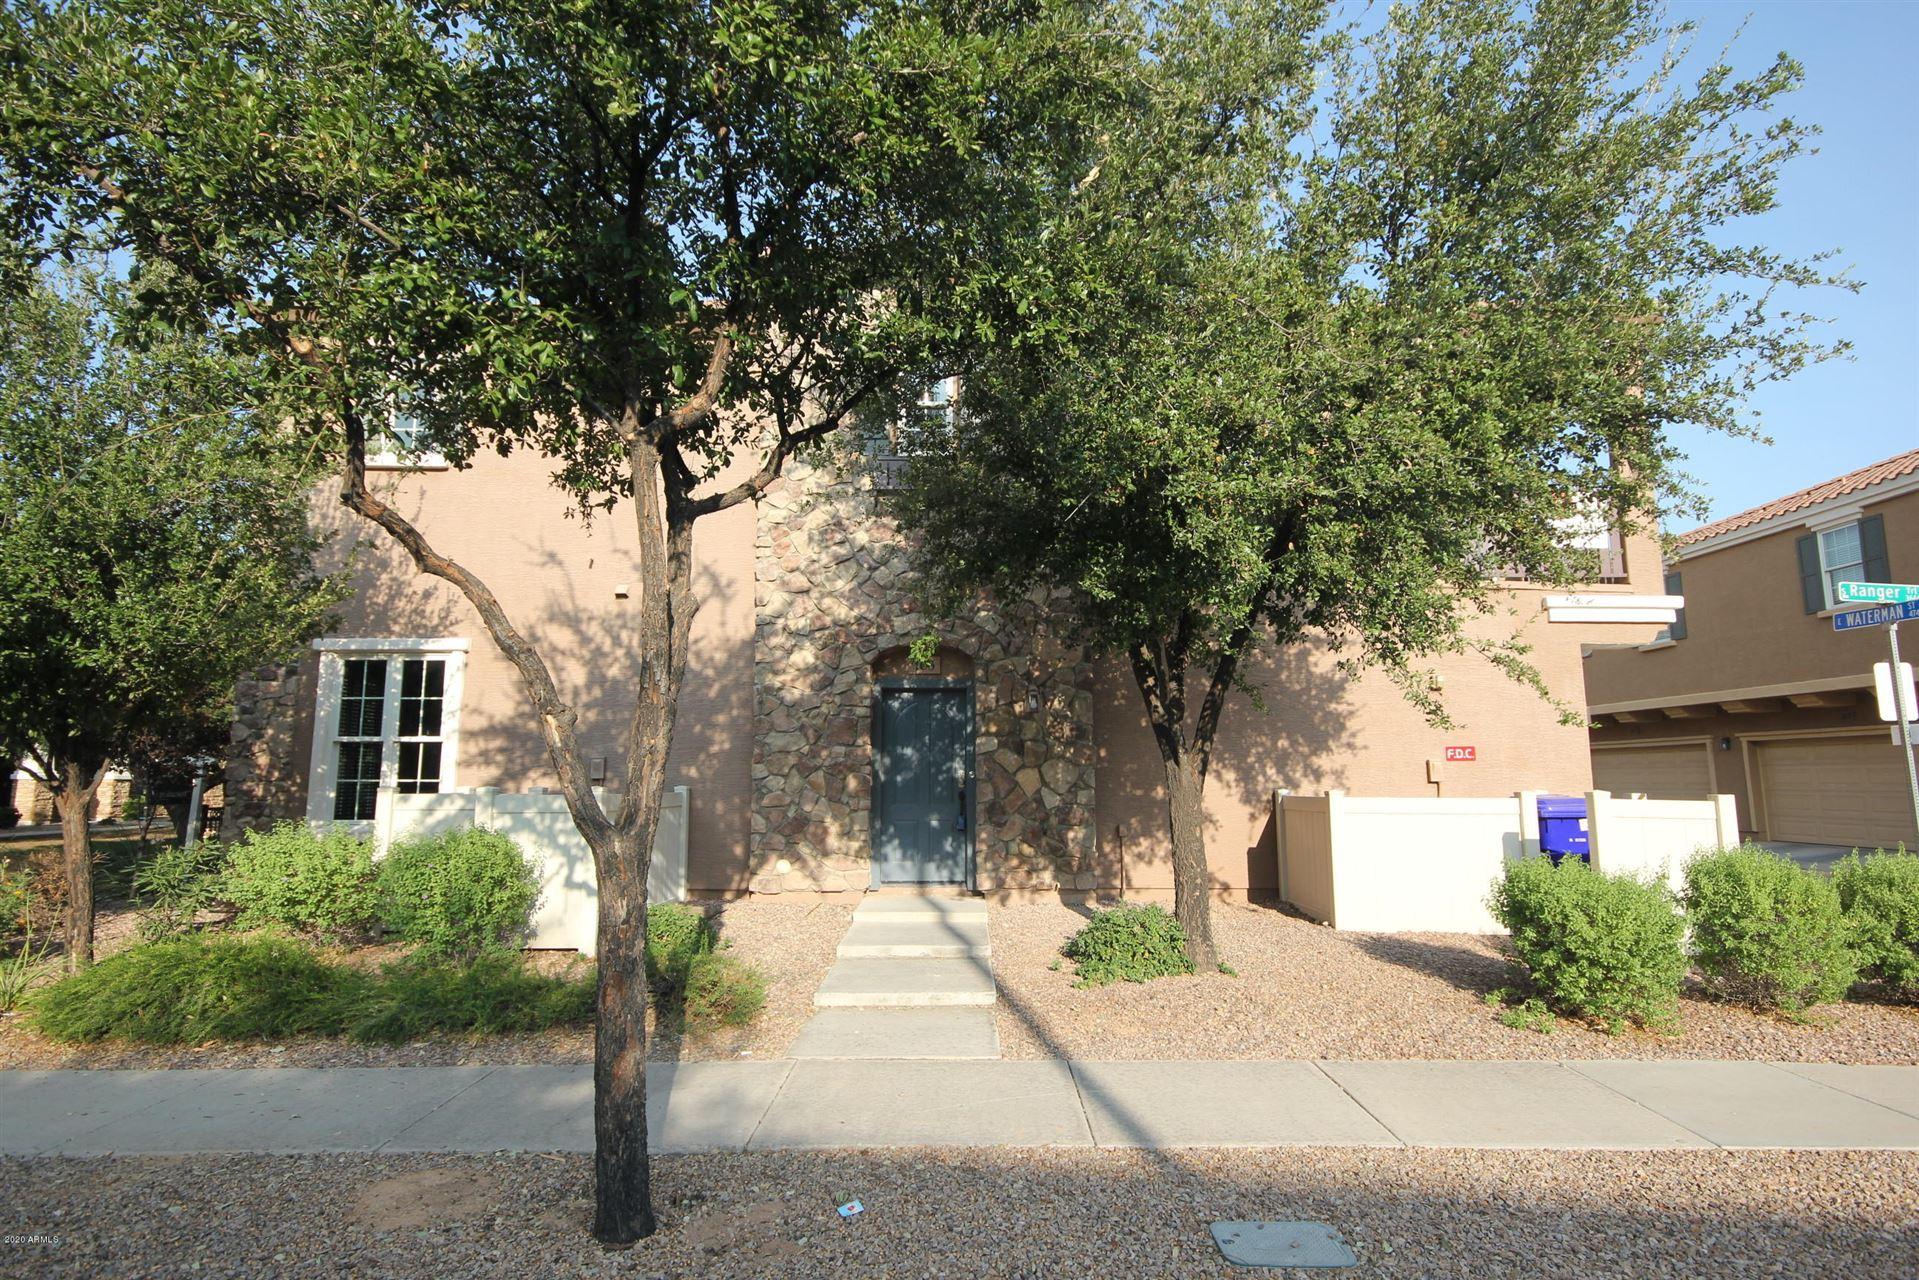 4748 E WATERMAN Street #103, Gilbert, AZ 85297 - MLS#: 6132812